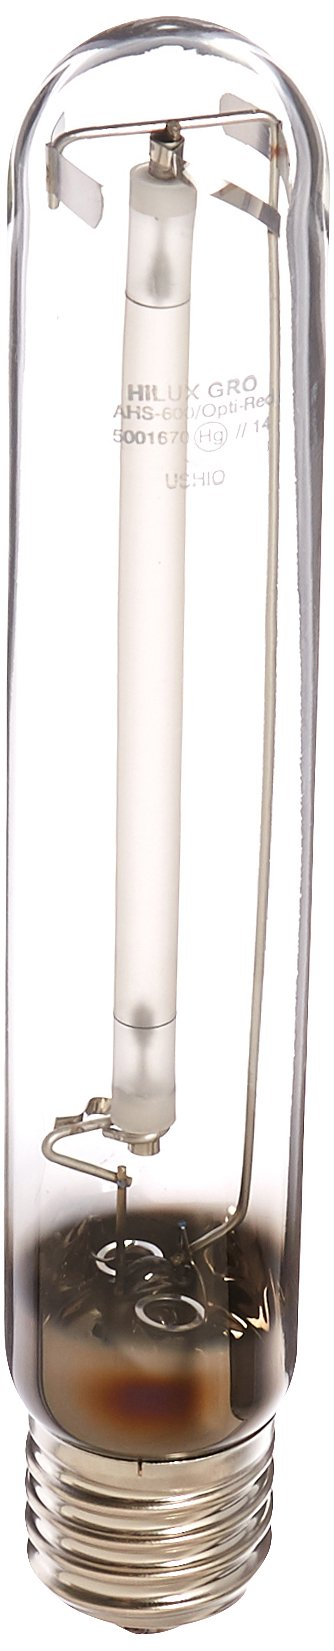 Ushio US5001670 Enhanced Performance HPS Lamp